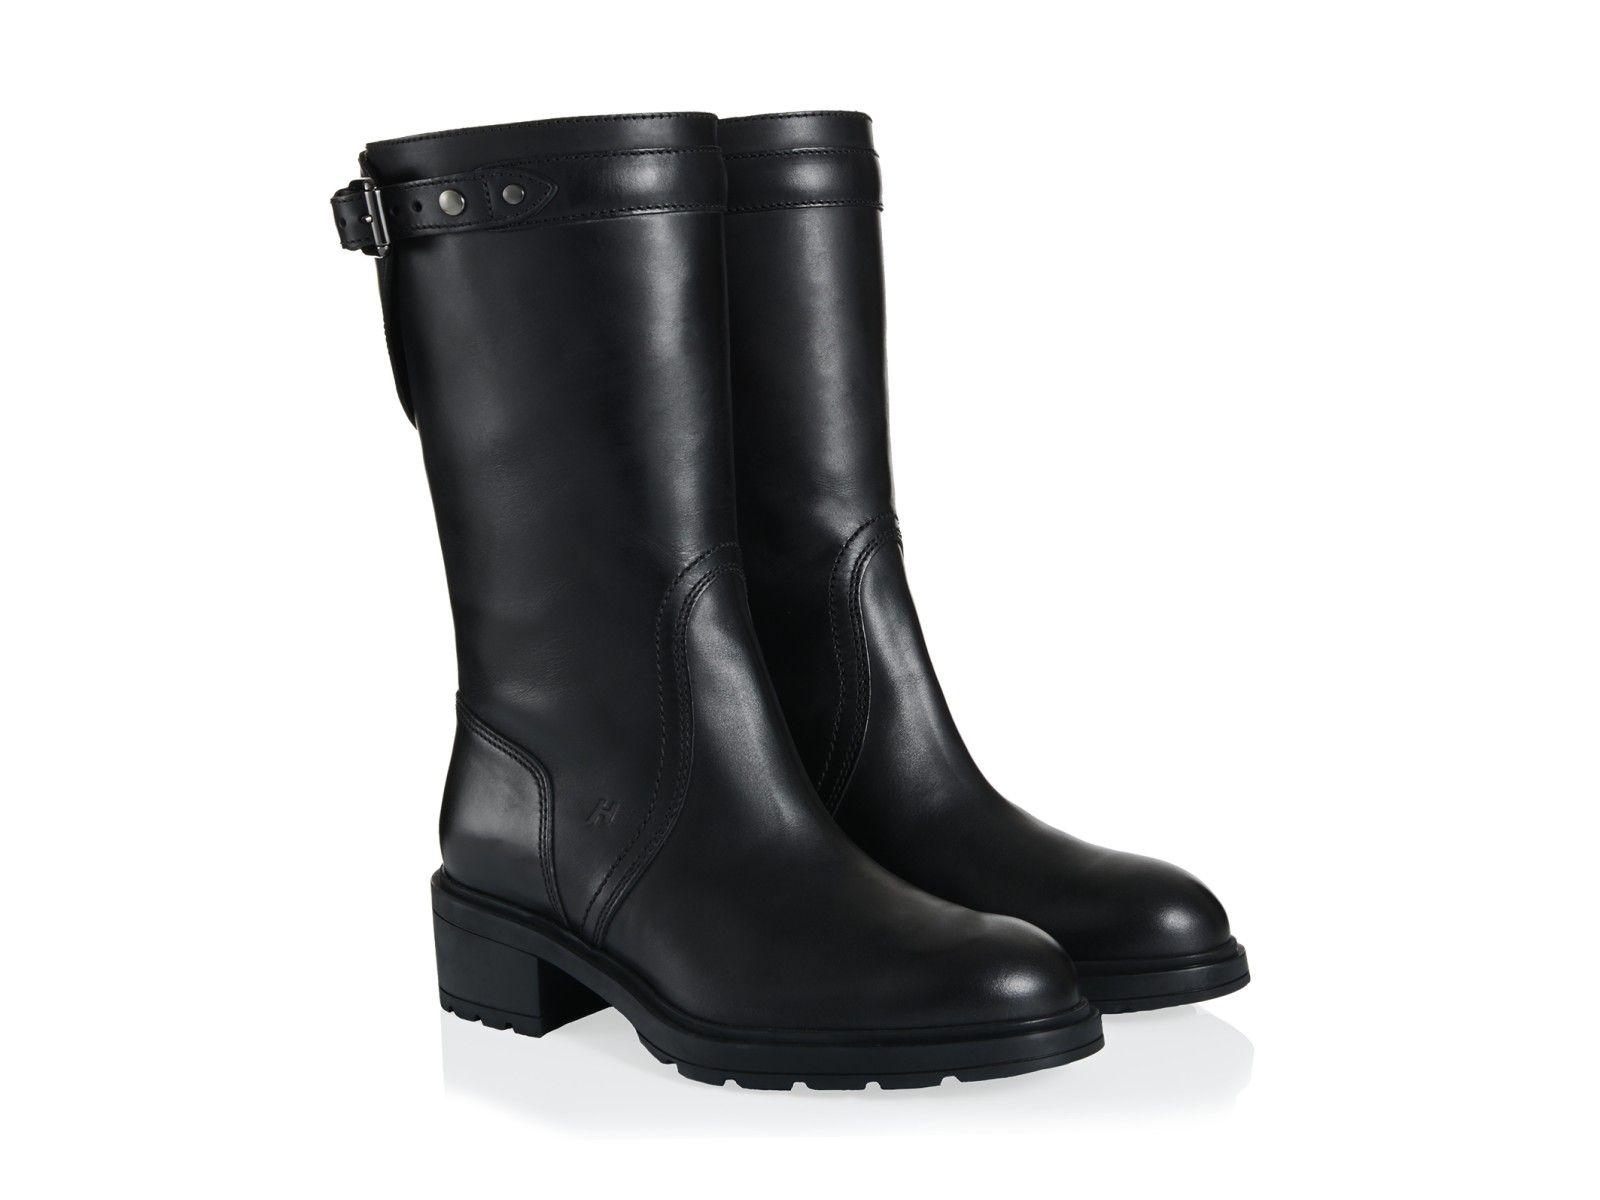 456bdfa37c83e Hogan women midcalf boots in black genuine Leather